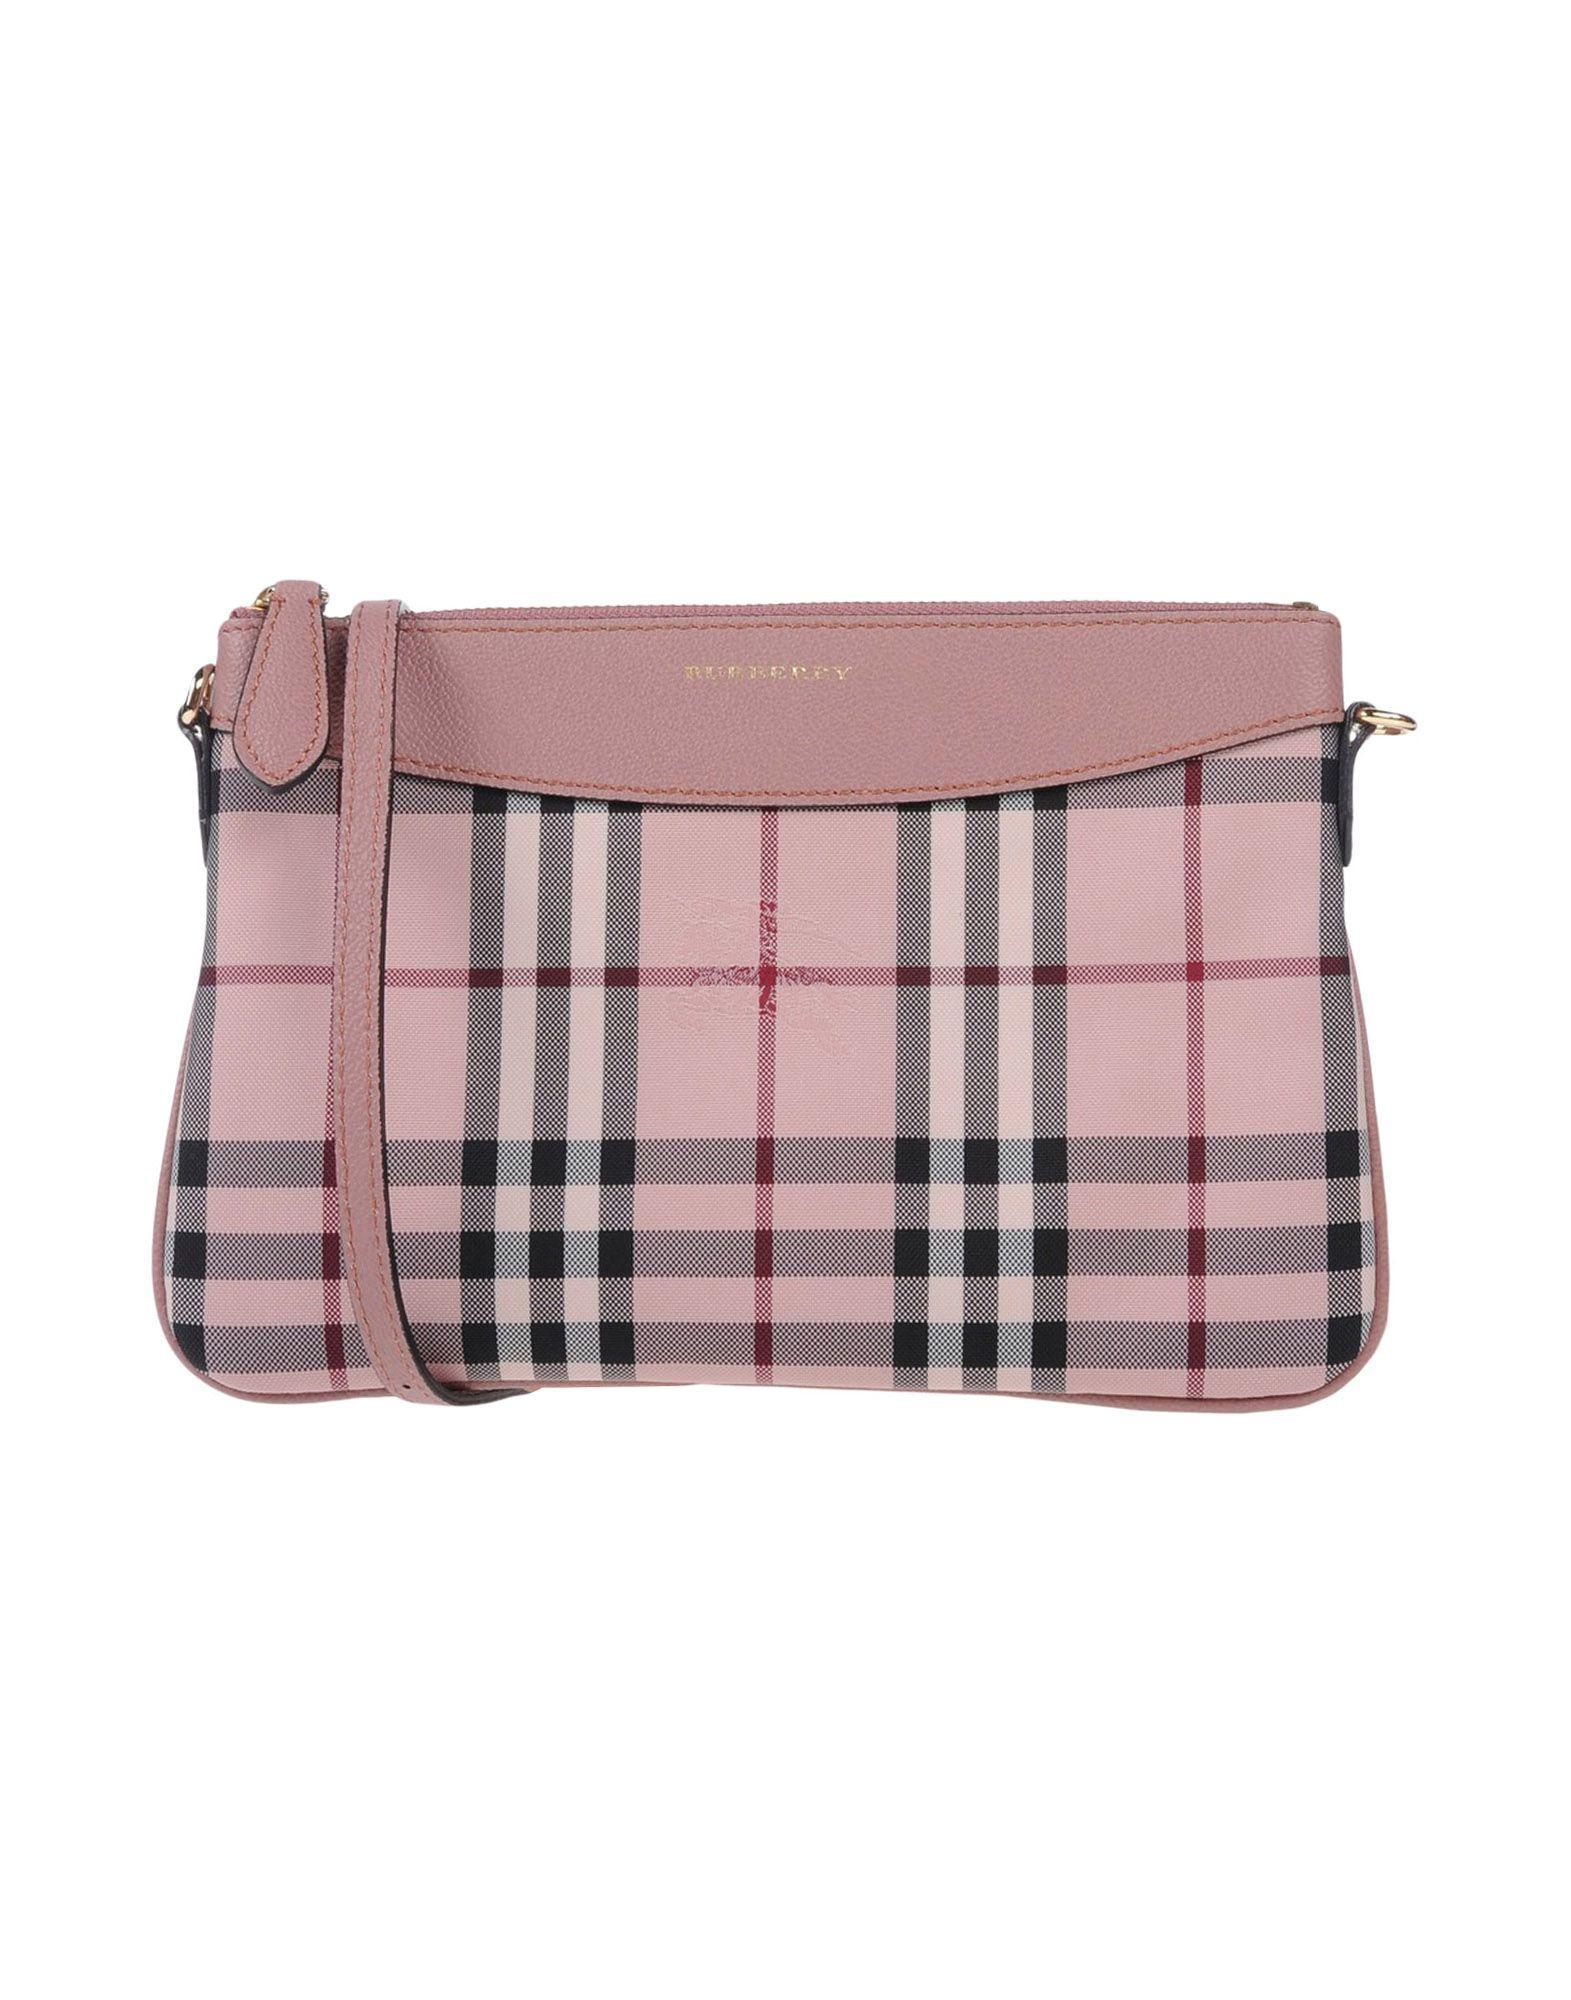 Burberry Handbags In Pastel Pink